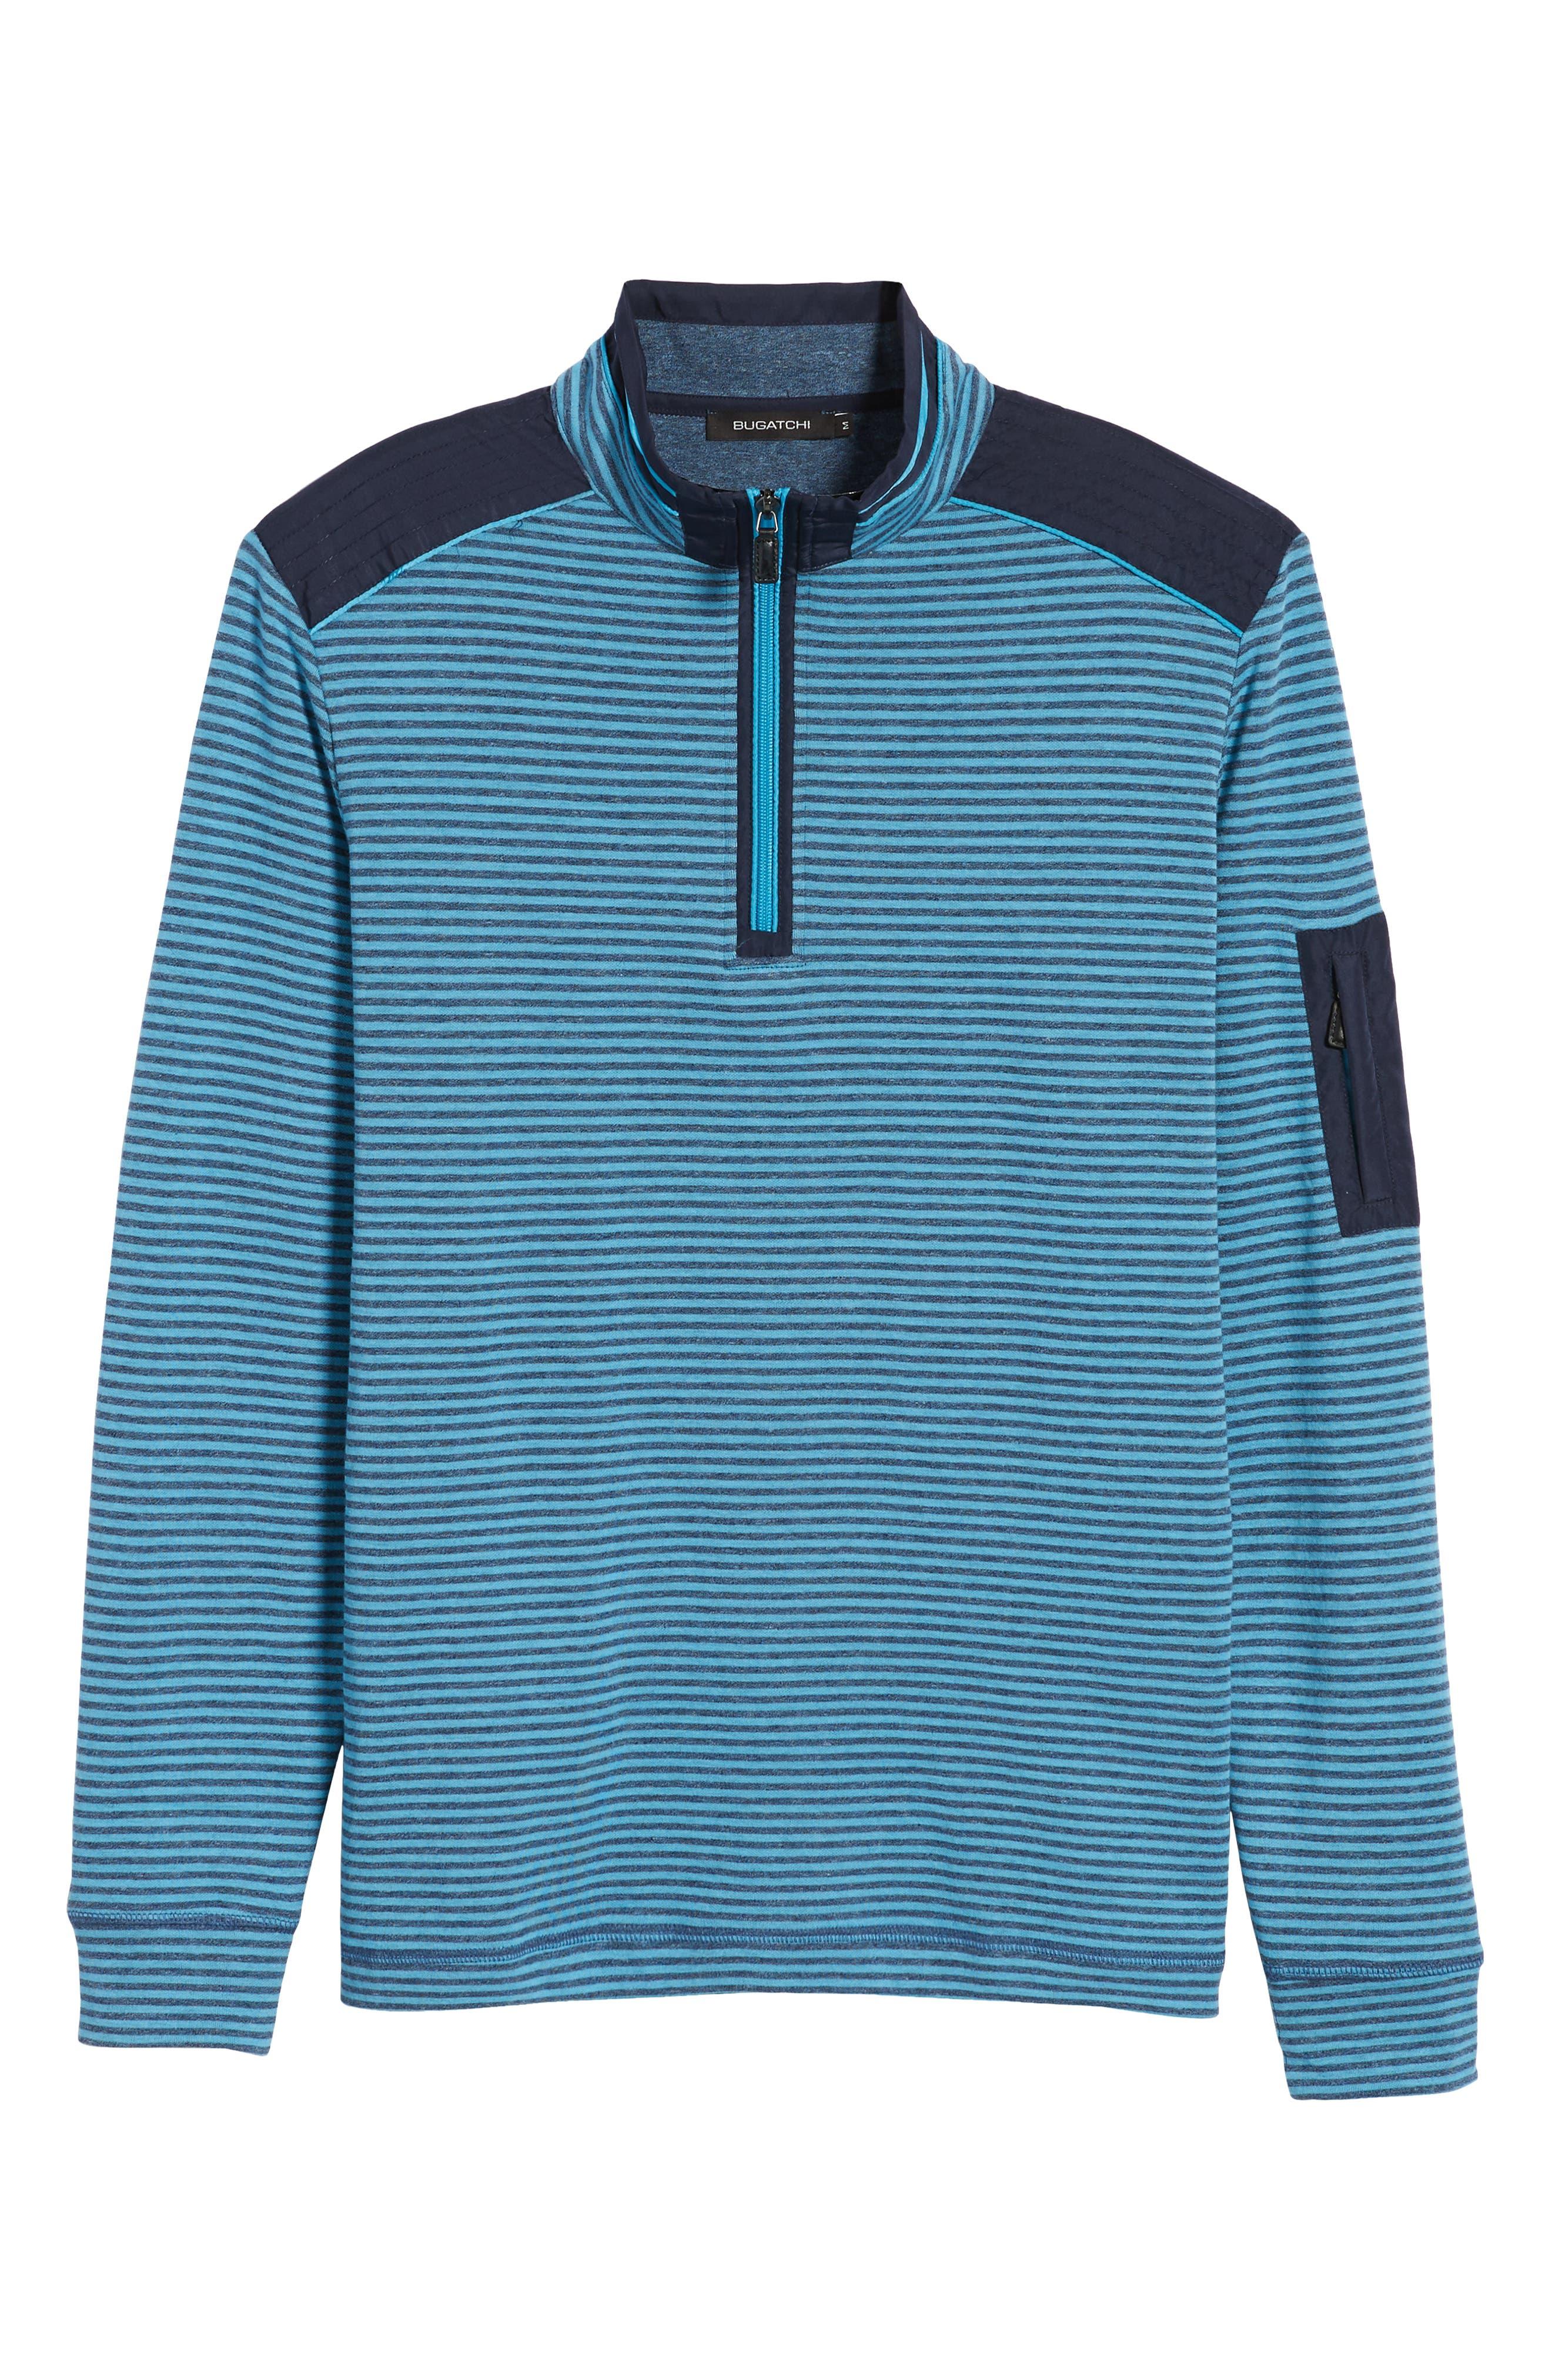 Regular Fit Stripe Quarter Zip Pullover,                             Alternate thumbnail 6, color,                             Sky